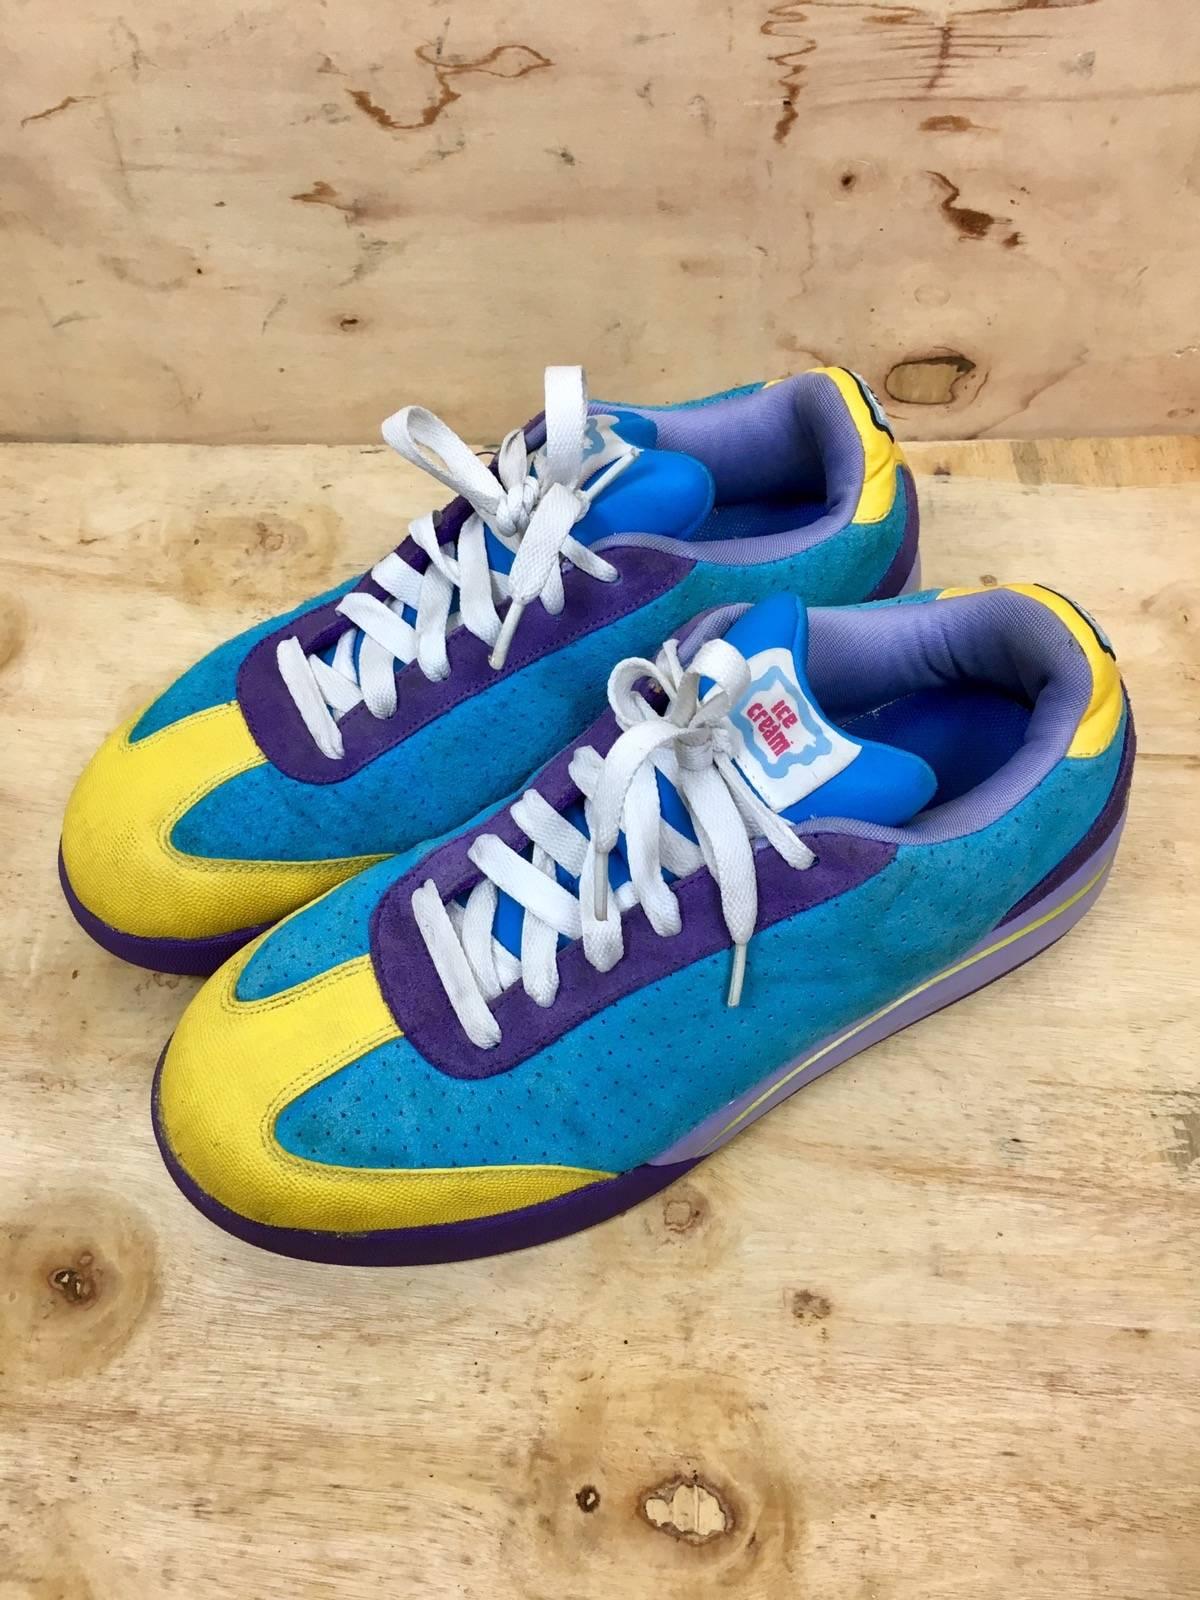 69ab24d0e524 Reebok × Icecream × Pharrell. Reebok Boardflip Ice Cream Skate shoe Pharrell  Williams BBC ...